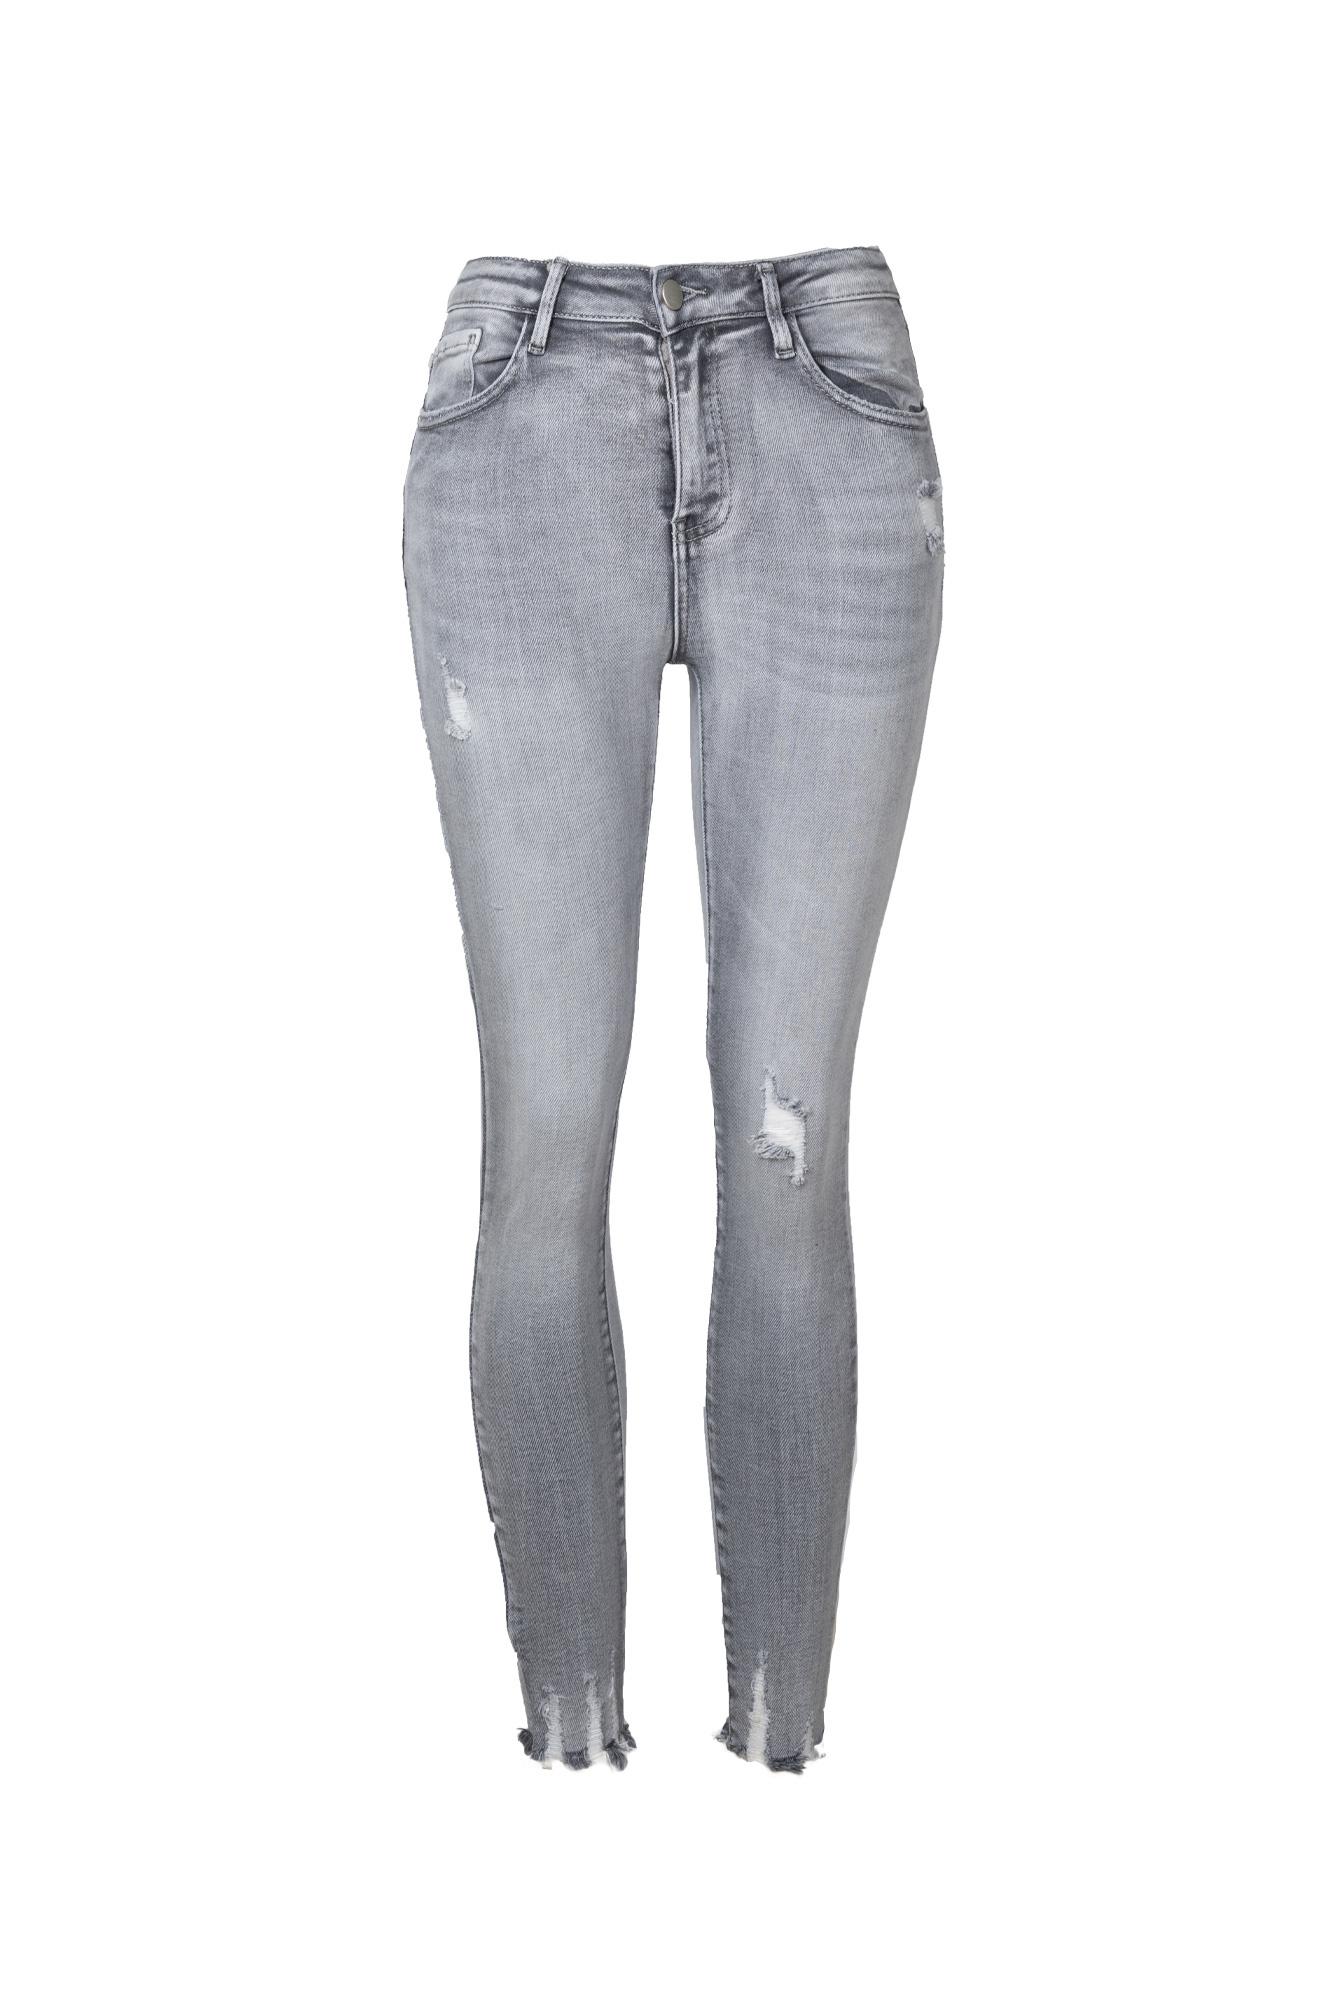 Distressed skinny jeans grijs Lexi